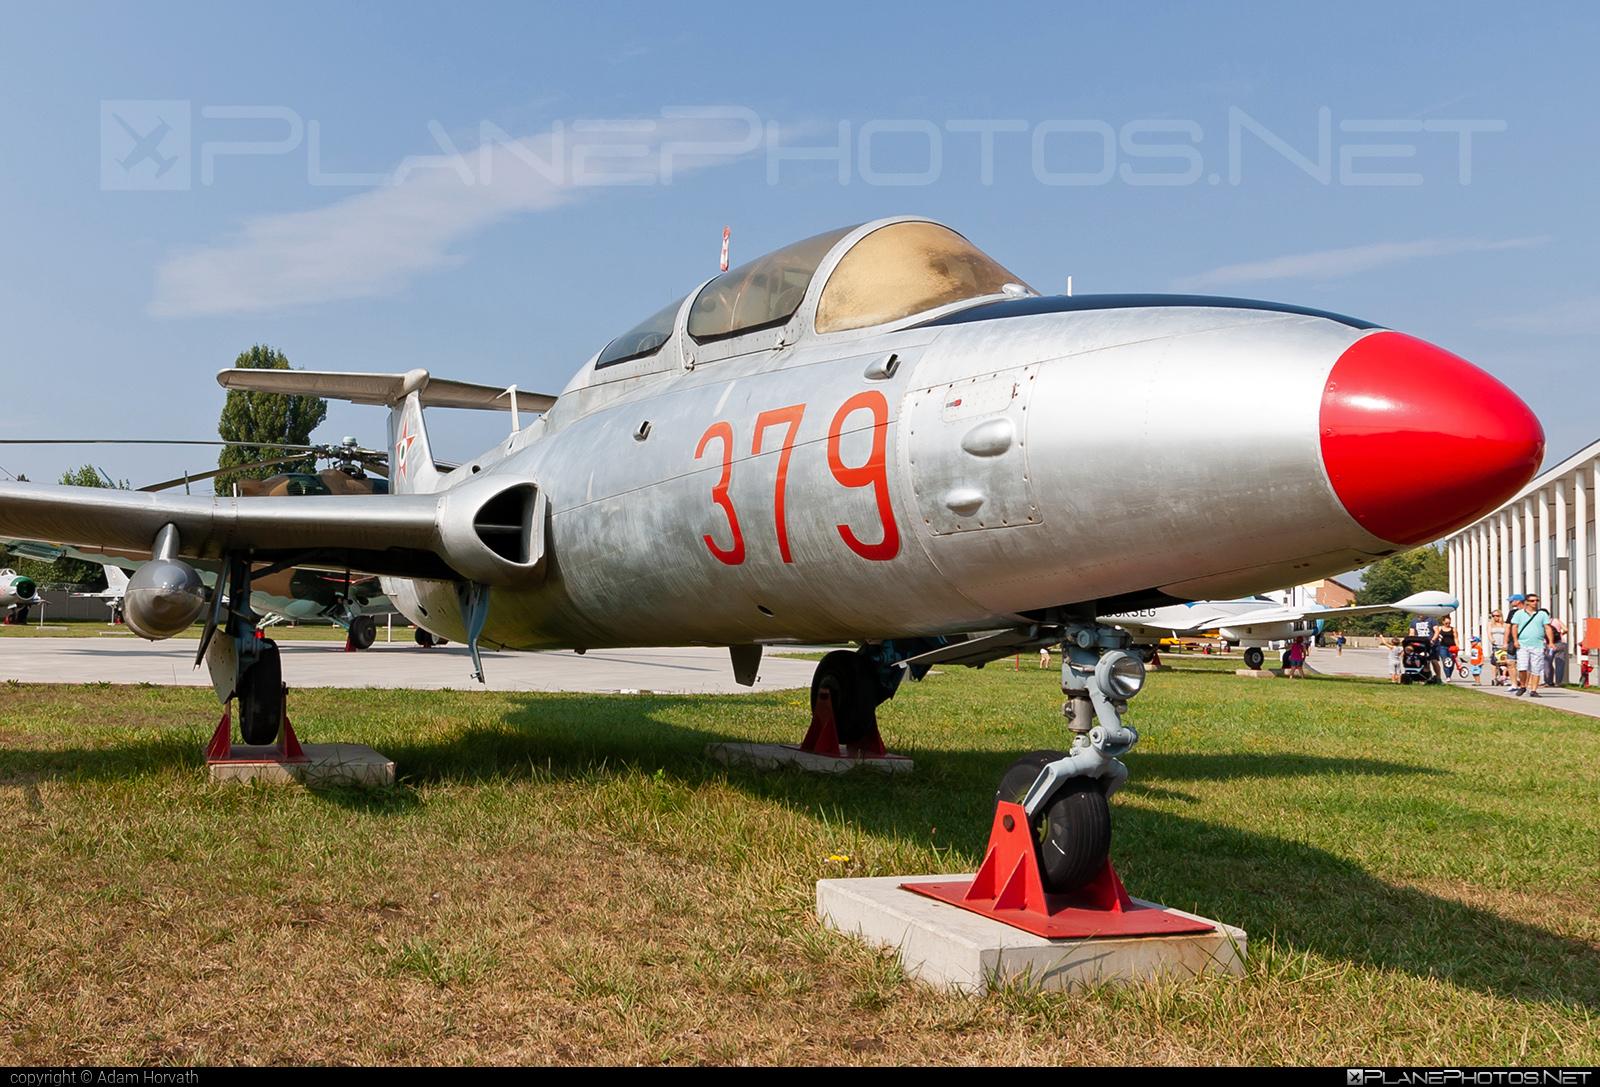 Aero L-29 Delfin - 379 operated by Magyar Néphadsereg (Hungarian People's Army) #aero #aerol29 #aerol29delfin #delfin #hungarianpeoplesarmy #l29 #magyarnephadsereg